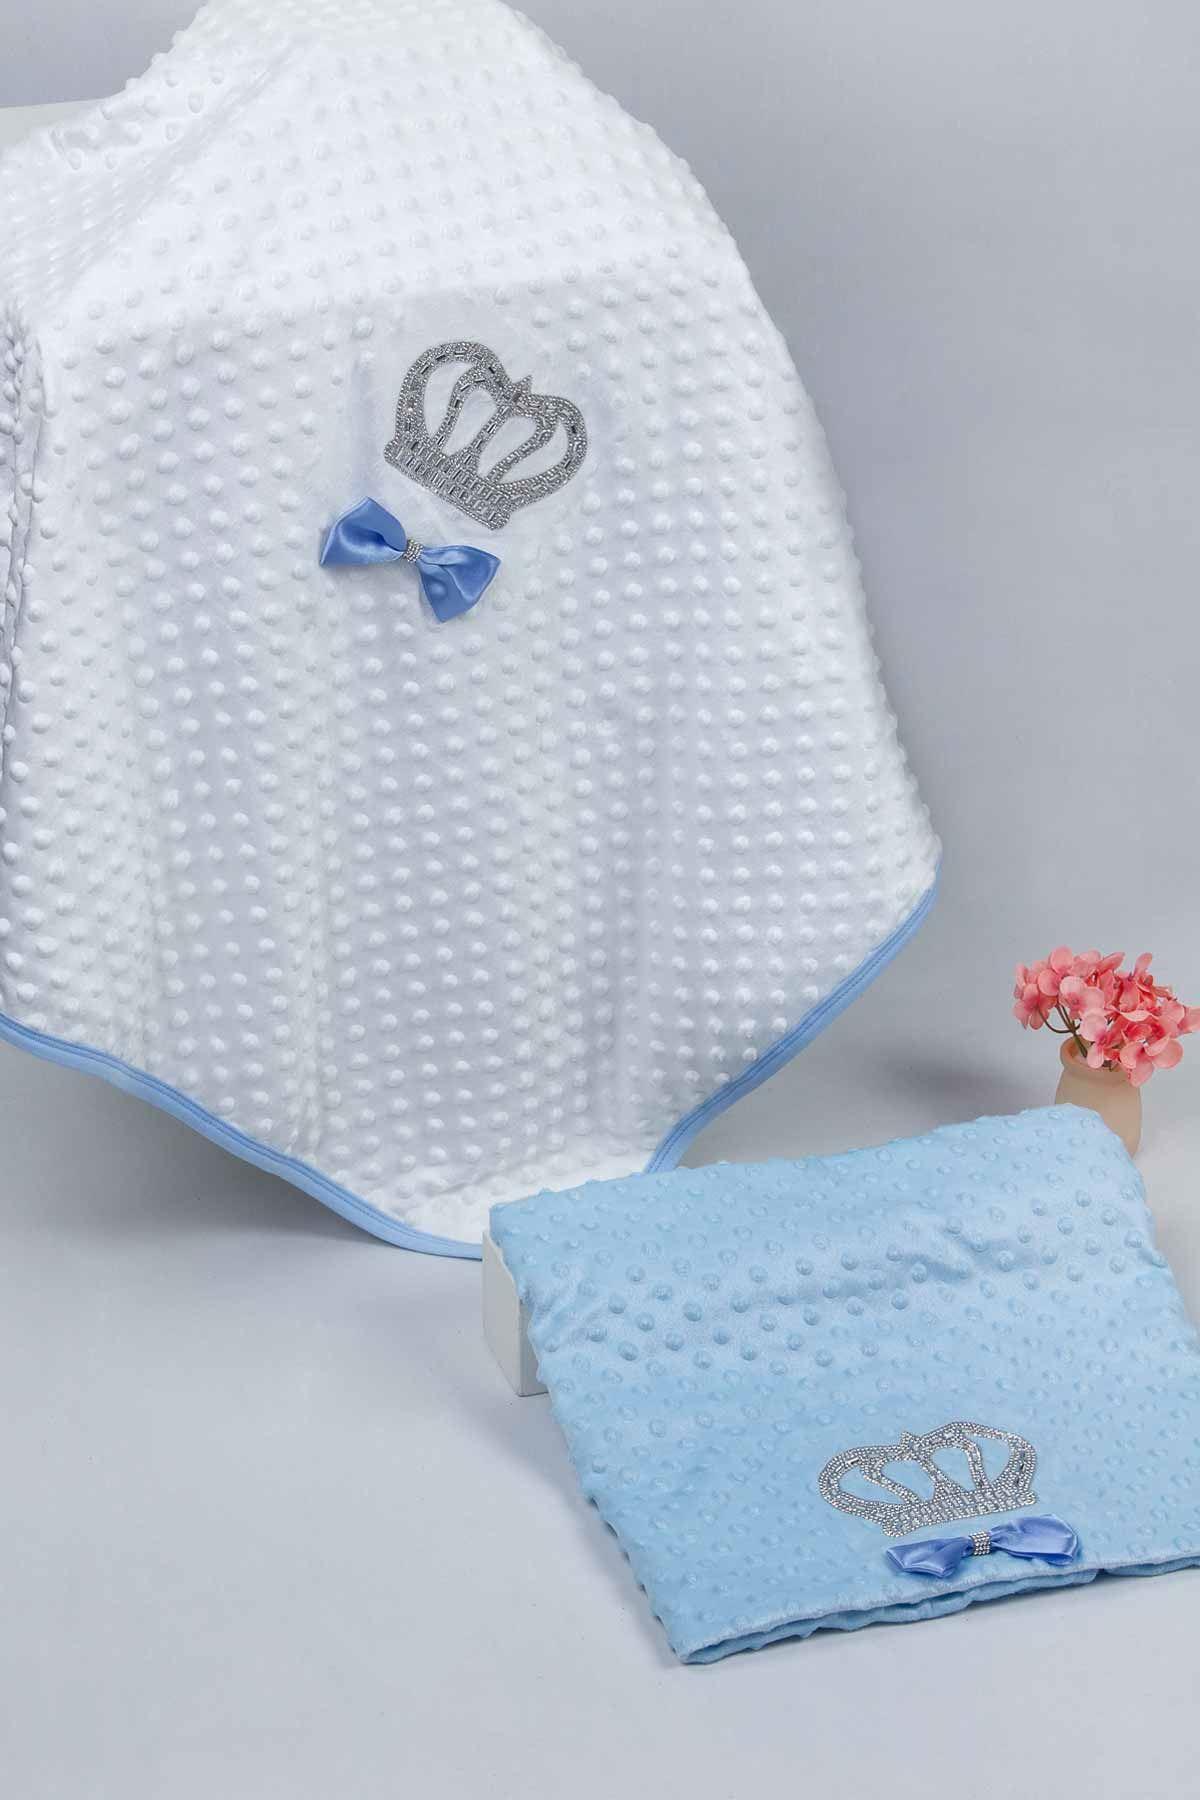 White 85 X90 cm Boy Babies Blanket King Queen Boys Baby Newborn Crown CottonEmbossed Ultra Soft Antibacterial Infants Models